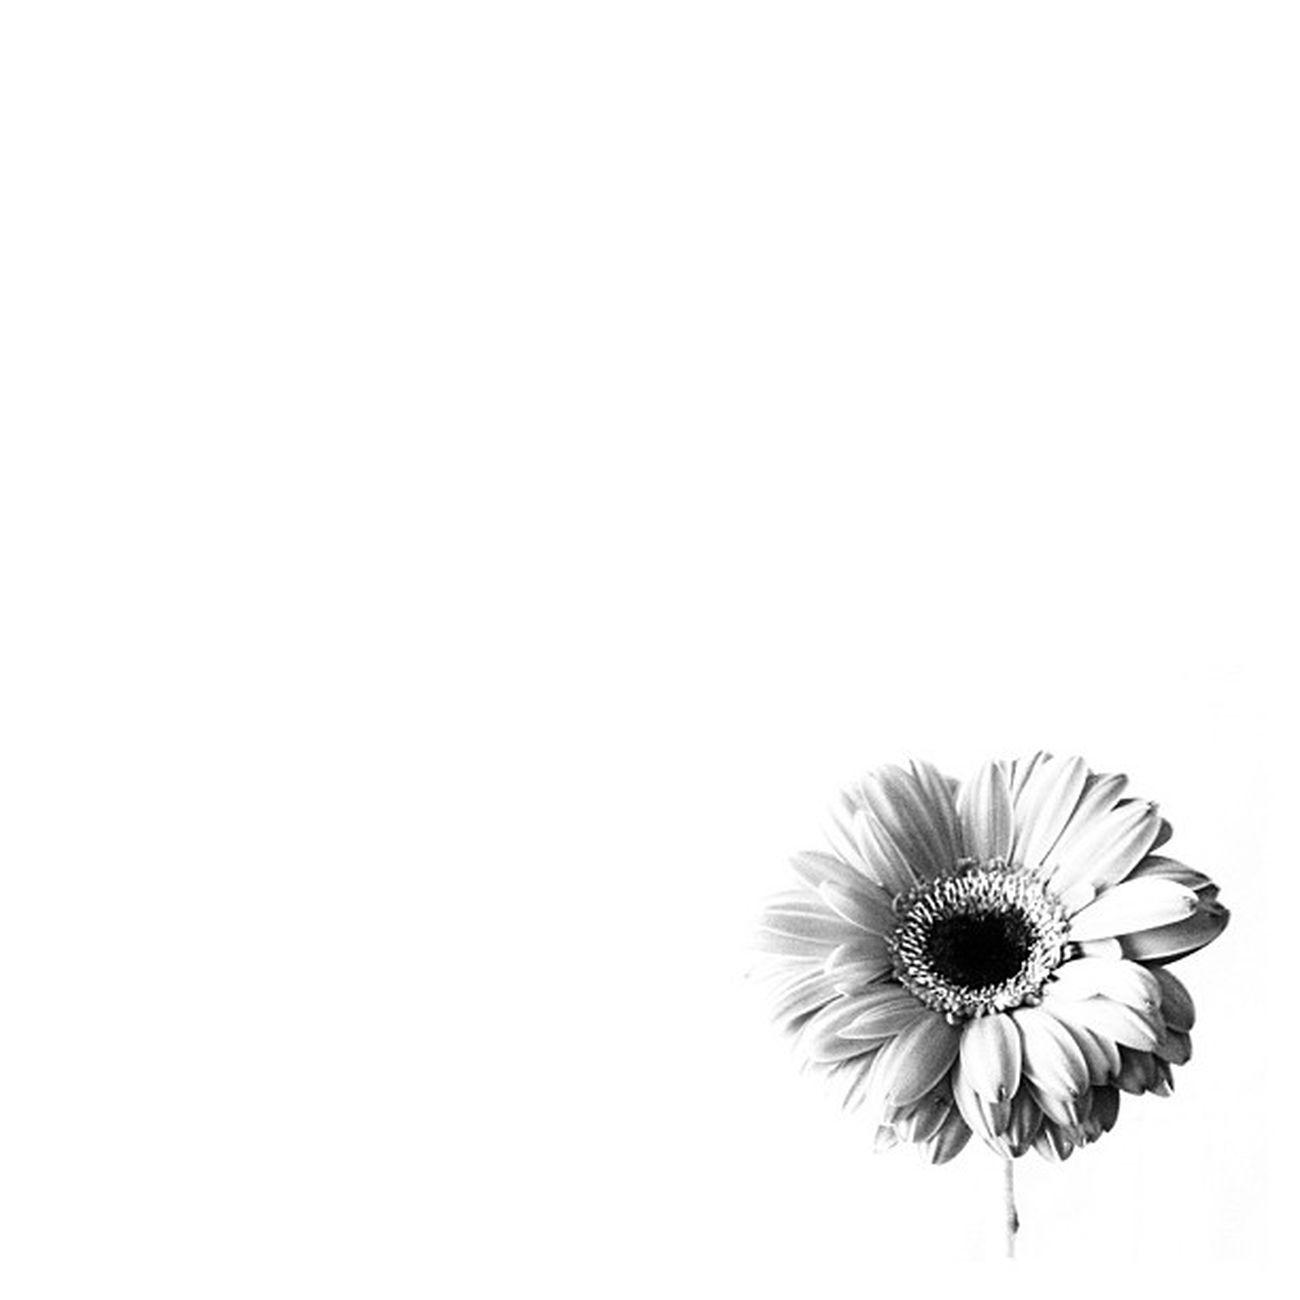 Had to do a black and white. #rsa_bw #bnw_life #royalsnappingartists #infamous_family #udog_bw #bw #bnw #bw_crew #bw_lover #bnw_worldwide #mdbw #bw_masters #ic_bw #irox_bw # monoart #monochrome #bwsquare Rsa_graphics Unsung_masters Monochrome Bnw_captures Bw Udog_bw Bnw Worldcaptures Bw_lover Mdbw Bwsquare Igminimal Irox_bw Rsa_bw Bw_crew Bw_masters Ic_bw Blackandwhite_nio Infamous_family Royalsnappingartists Bnw_worldwide Rsa_bnw Bnw_life Nothingisordinary